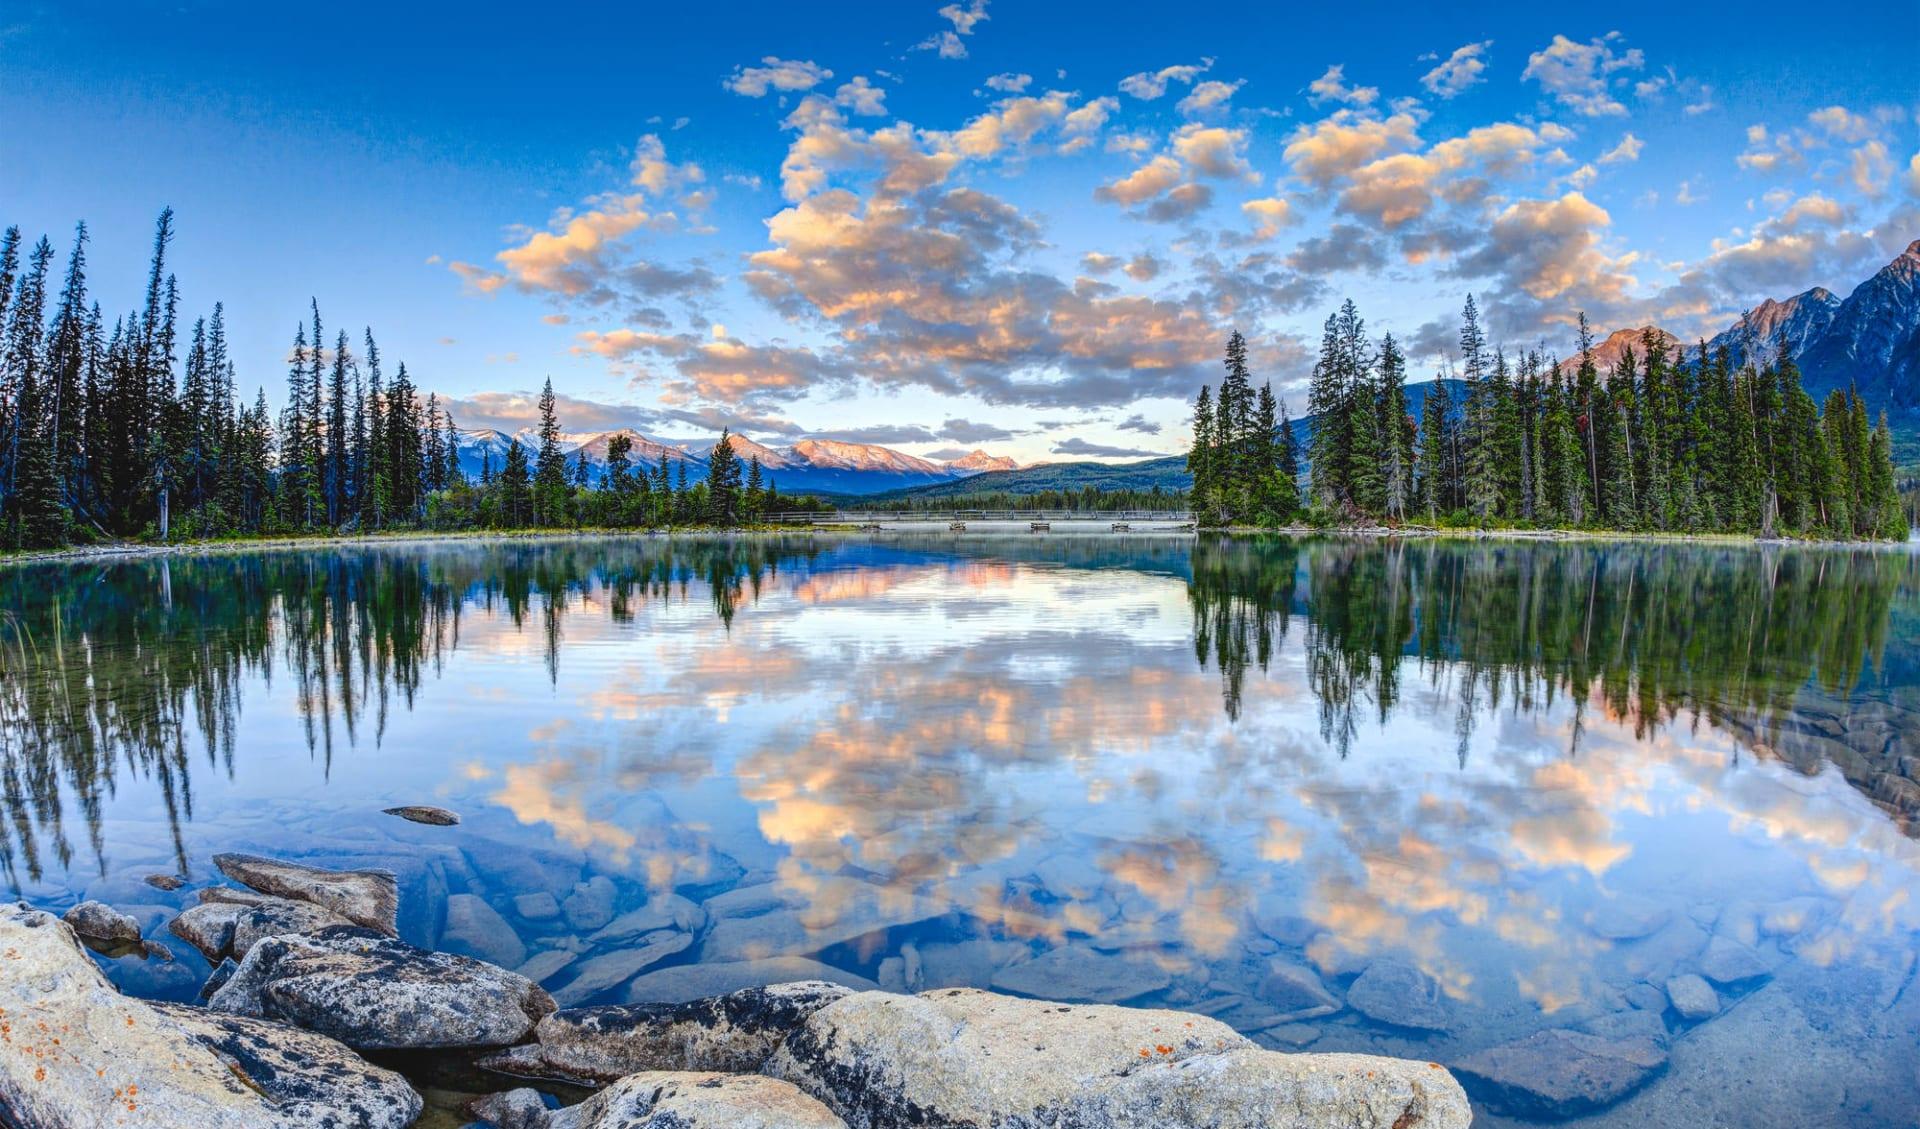 Westkanada Classic 18 Tage ab Vancouver: Kanada - Jasper Nationalpark - Sonnenaufgang